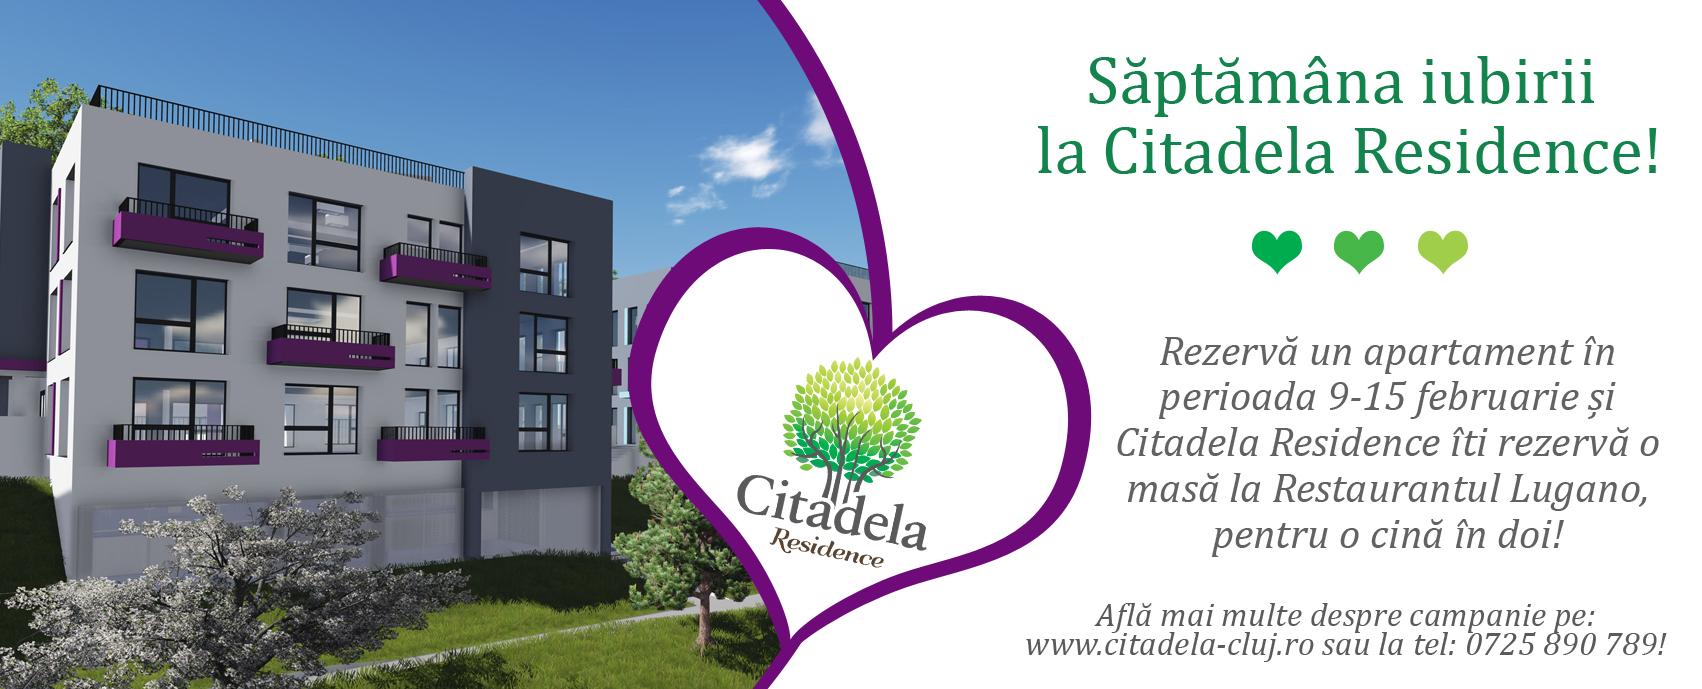 Saptamana iubirii la Citadela Residence